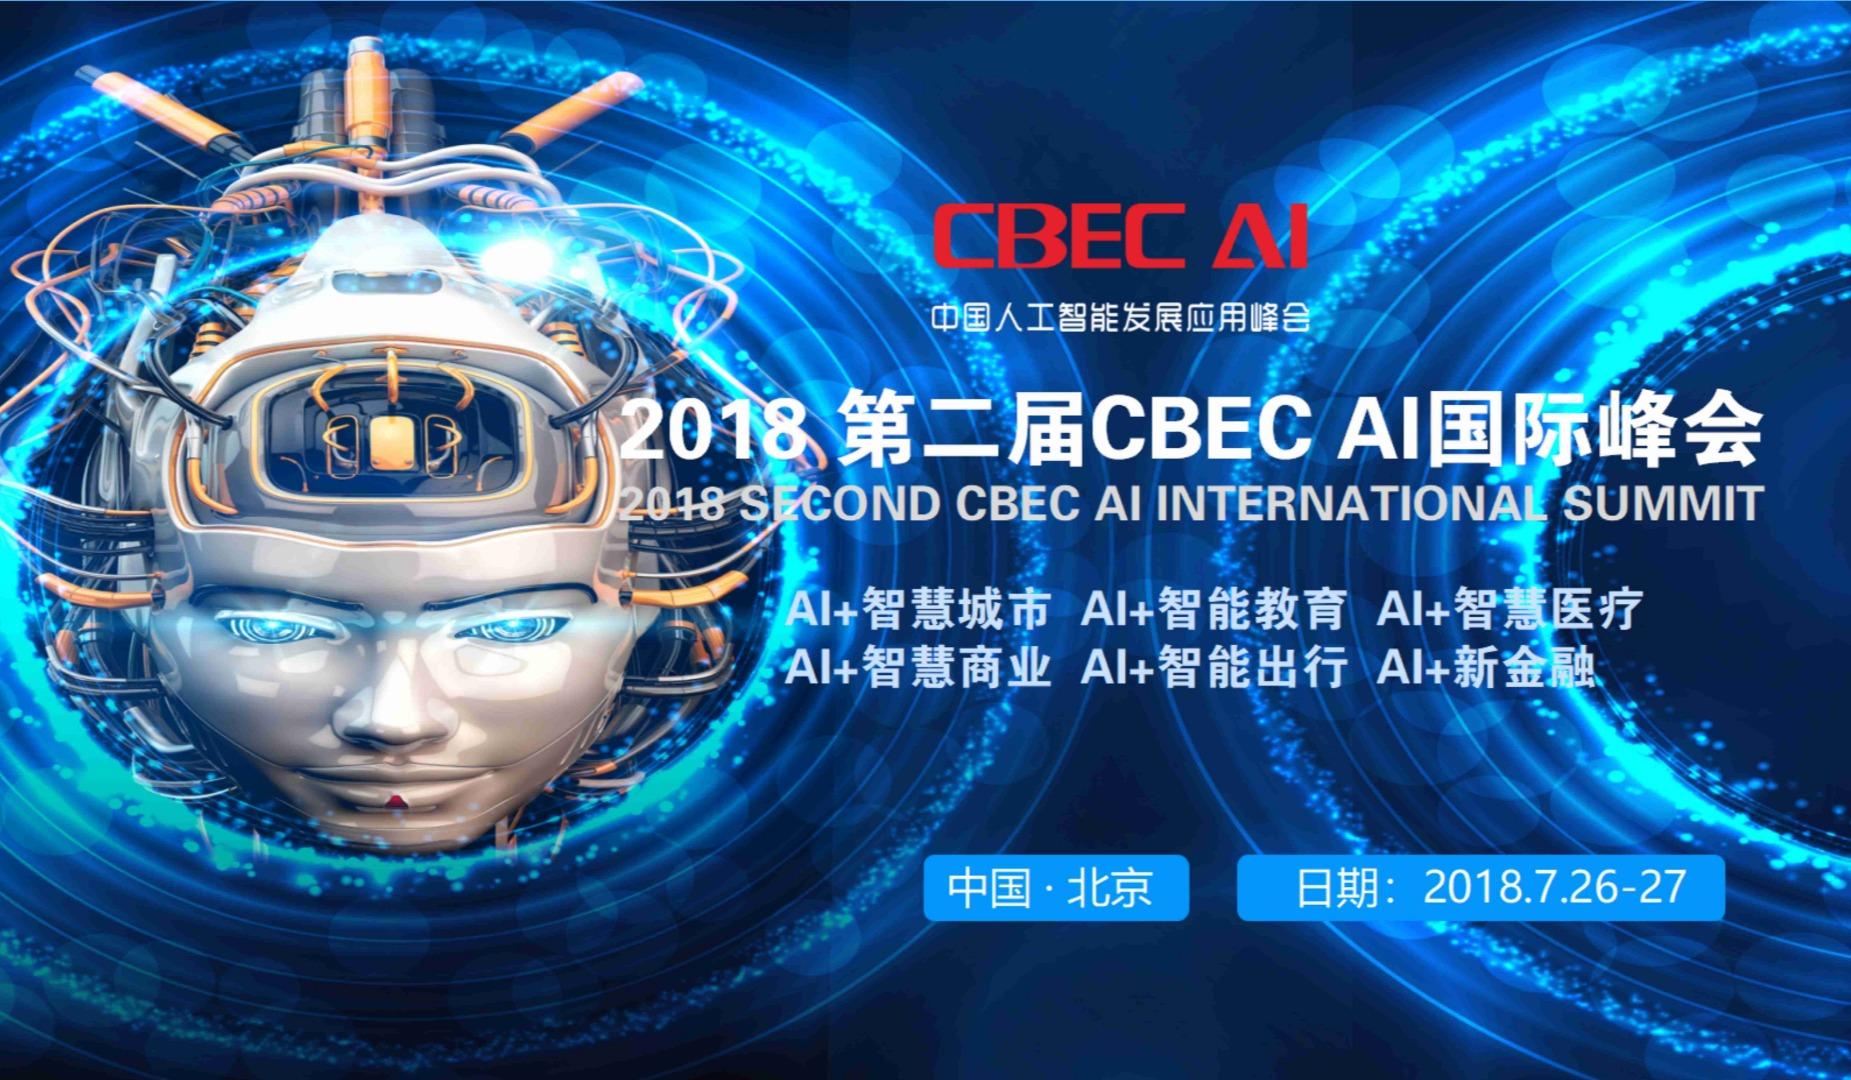 2018 CBEC AI 第二届中国人工智能国际峰会